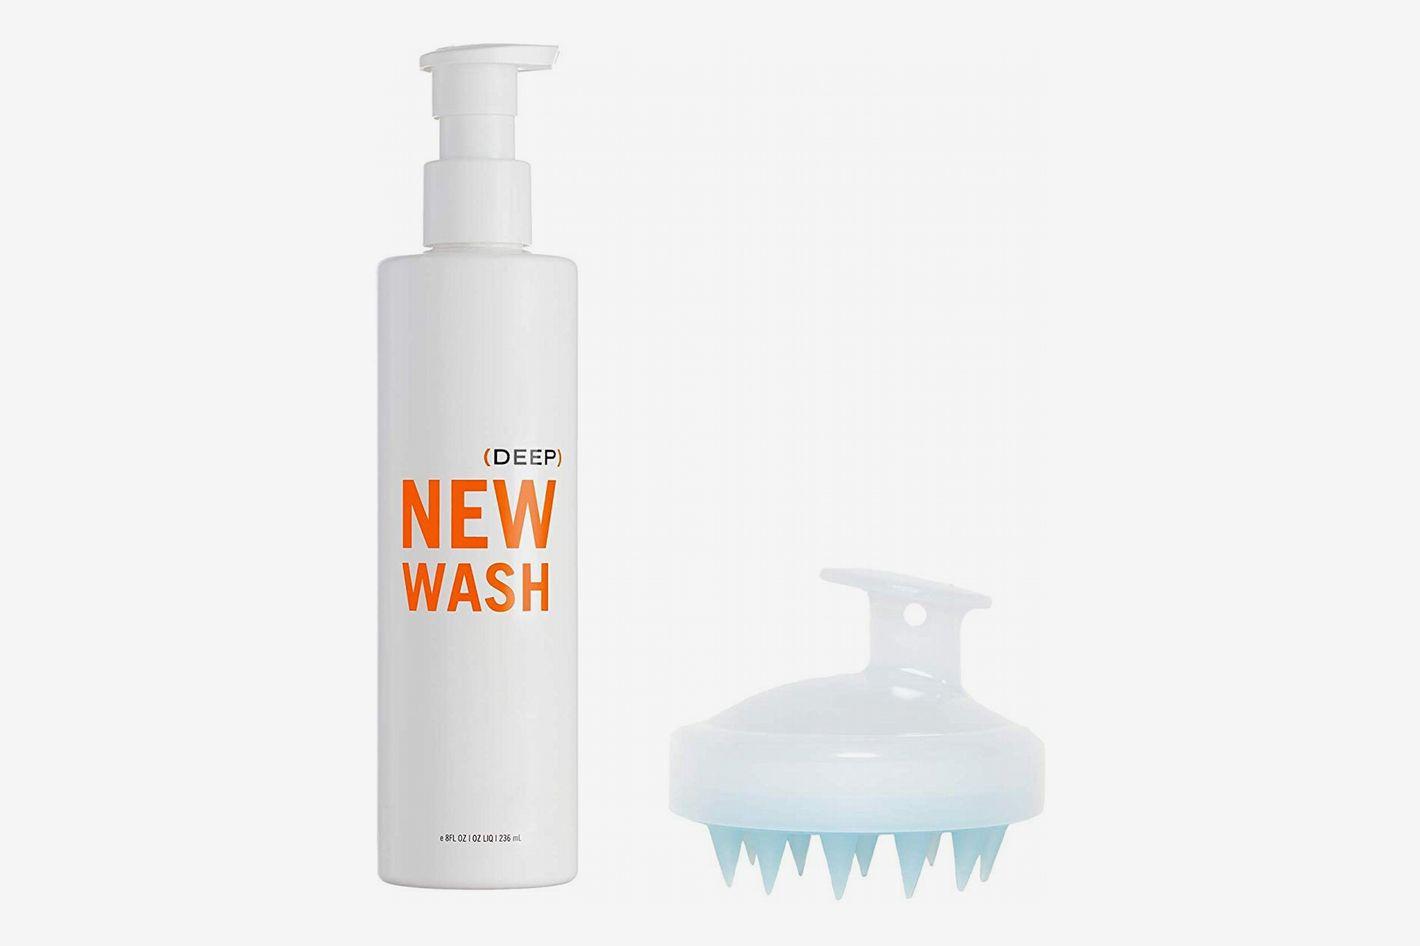 Hairstory New Wash (Deep) Hair Cleanser 8 oz + Shower Brush